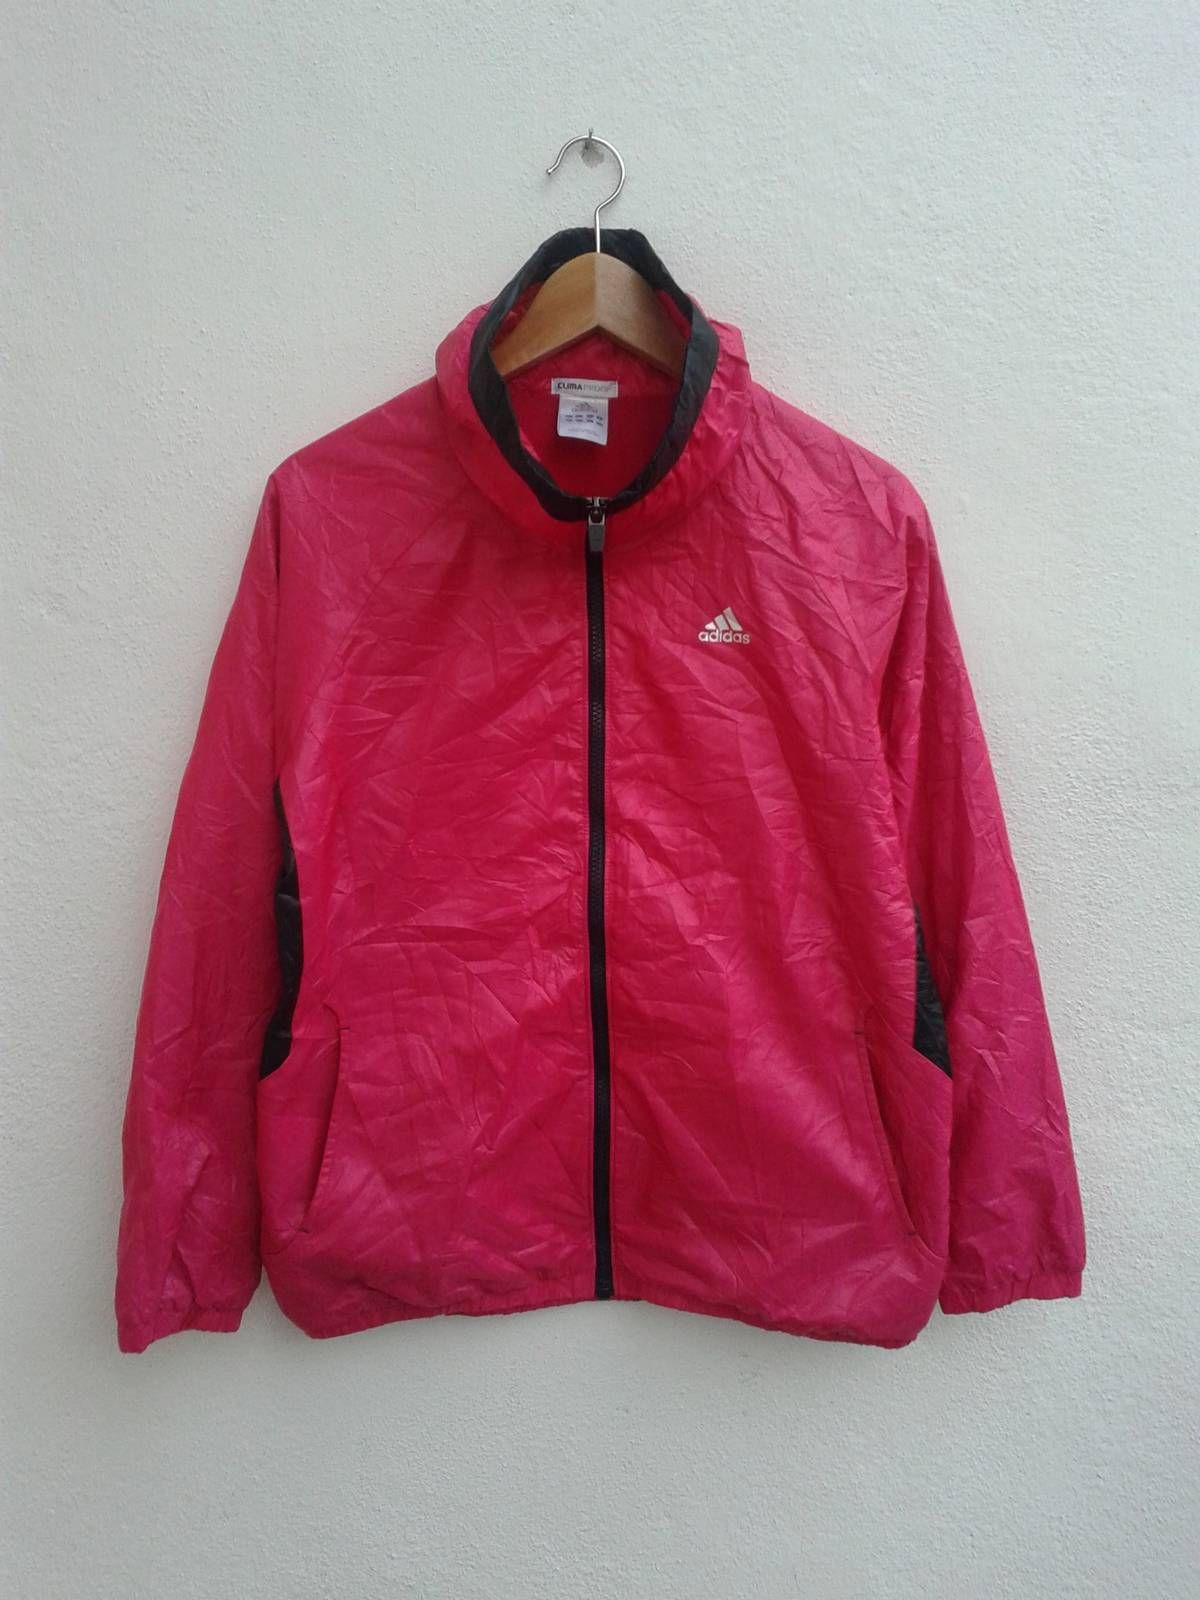 Adidas Adidas Clima Proof Windbreaker Basic Running Coat Vintage 90s Pink Jacket Sportswear Pink Jacket Jackets Windbreaker [ 1600 x 1200 Pixel ]